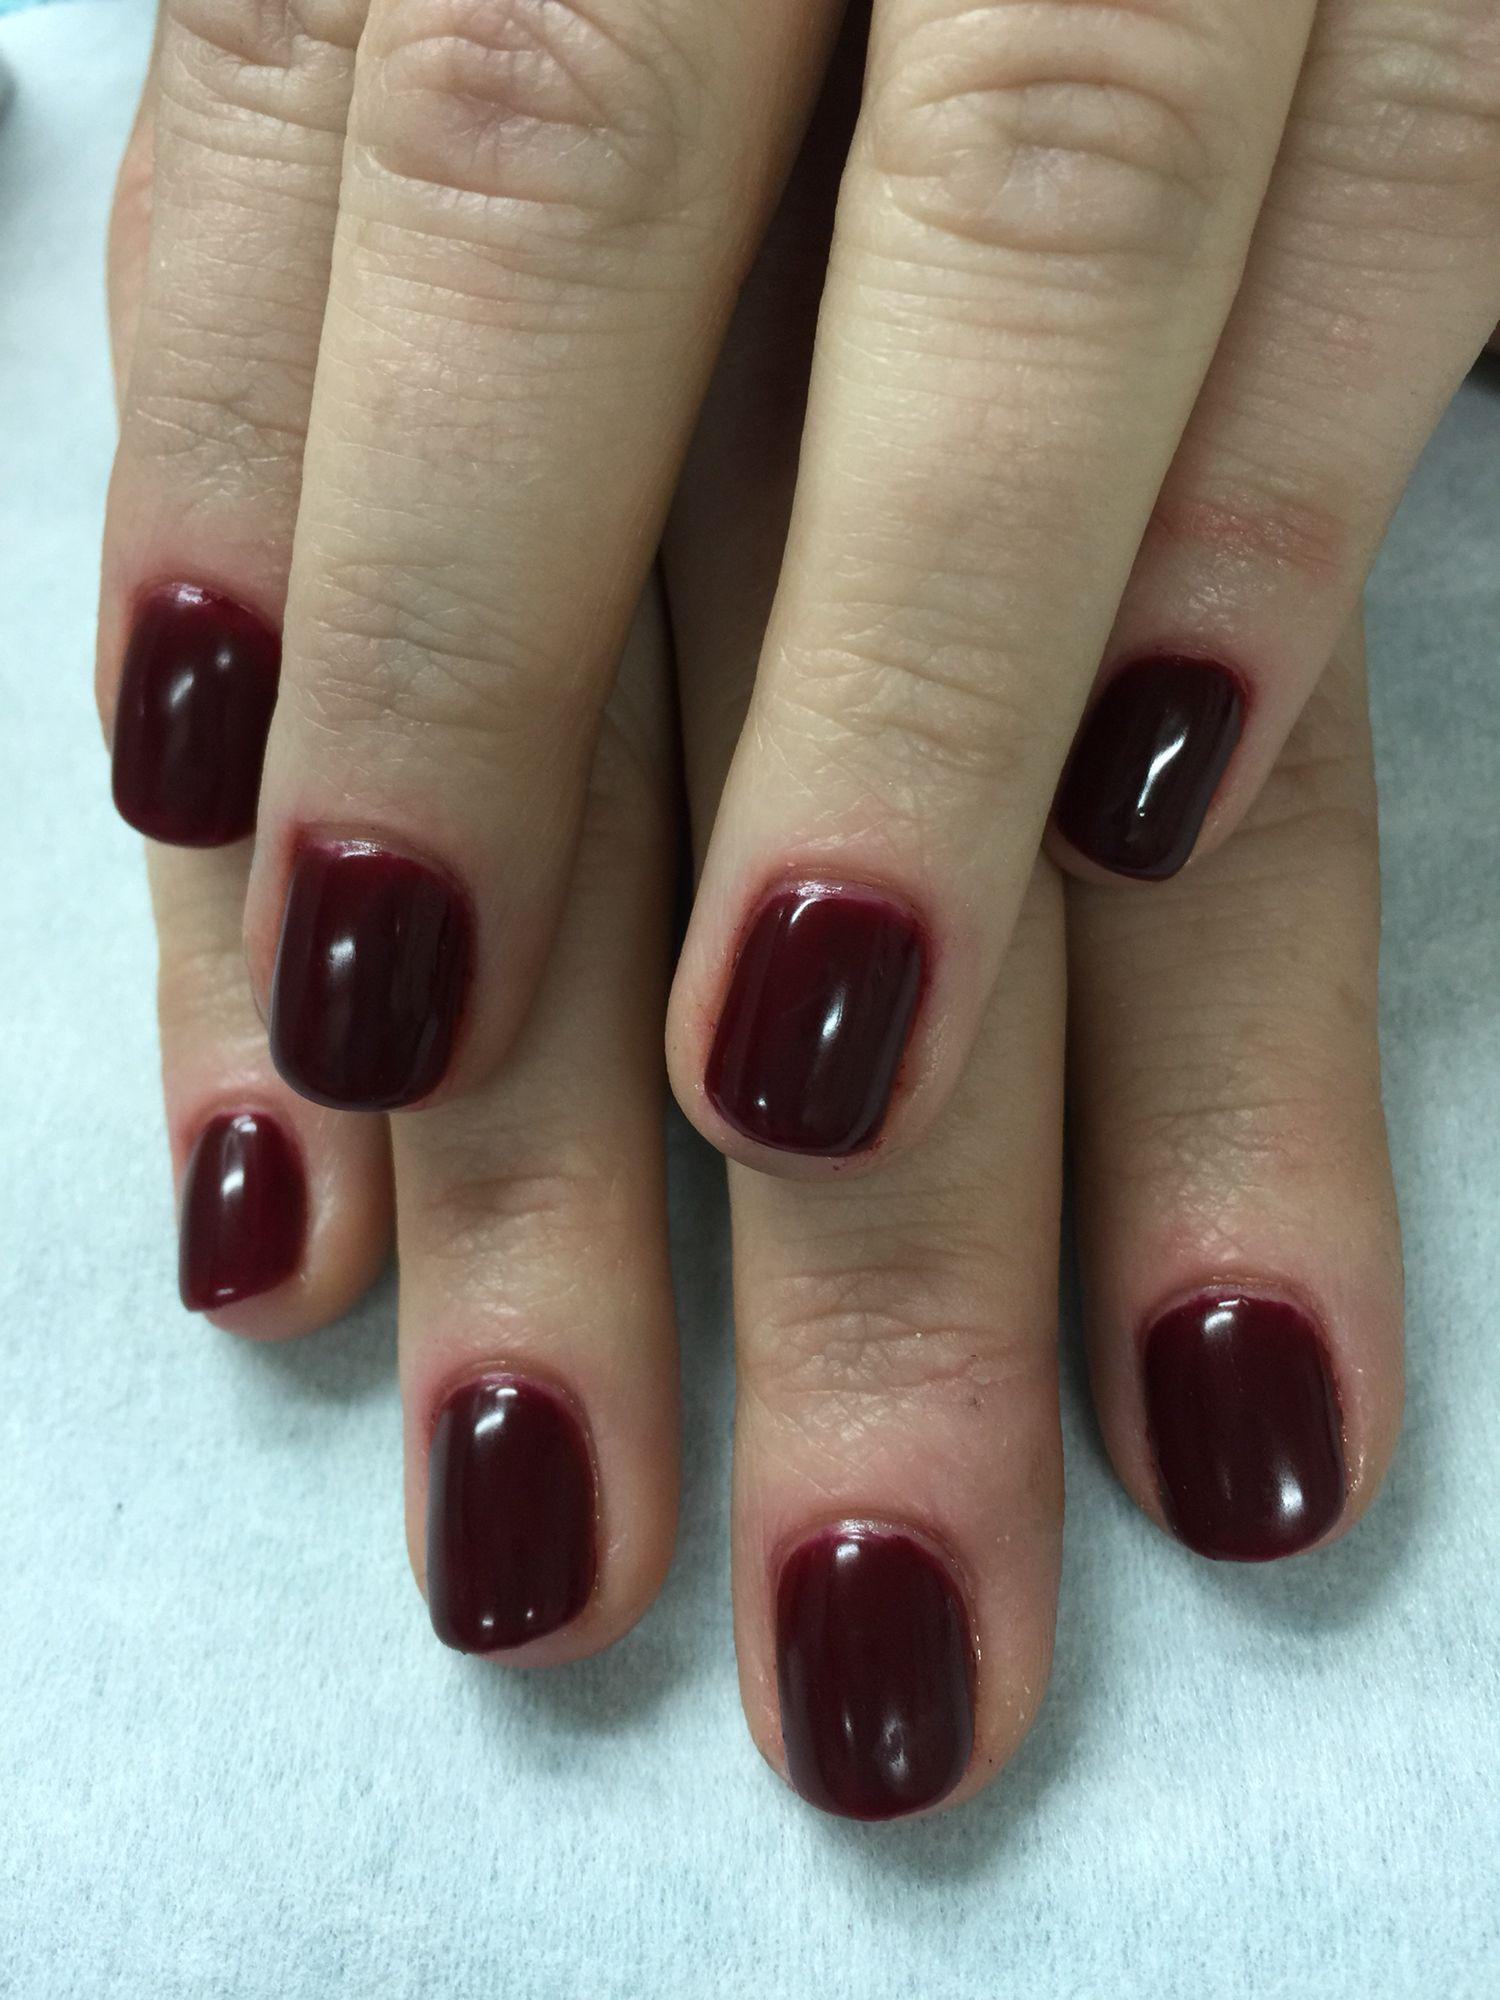 Fall Burgundy Wine Gel Polish Over Non Toxic Odorless Hard Gel Gel Nail Designs Gel Nails